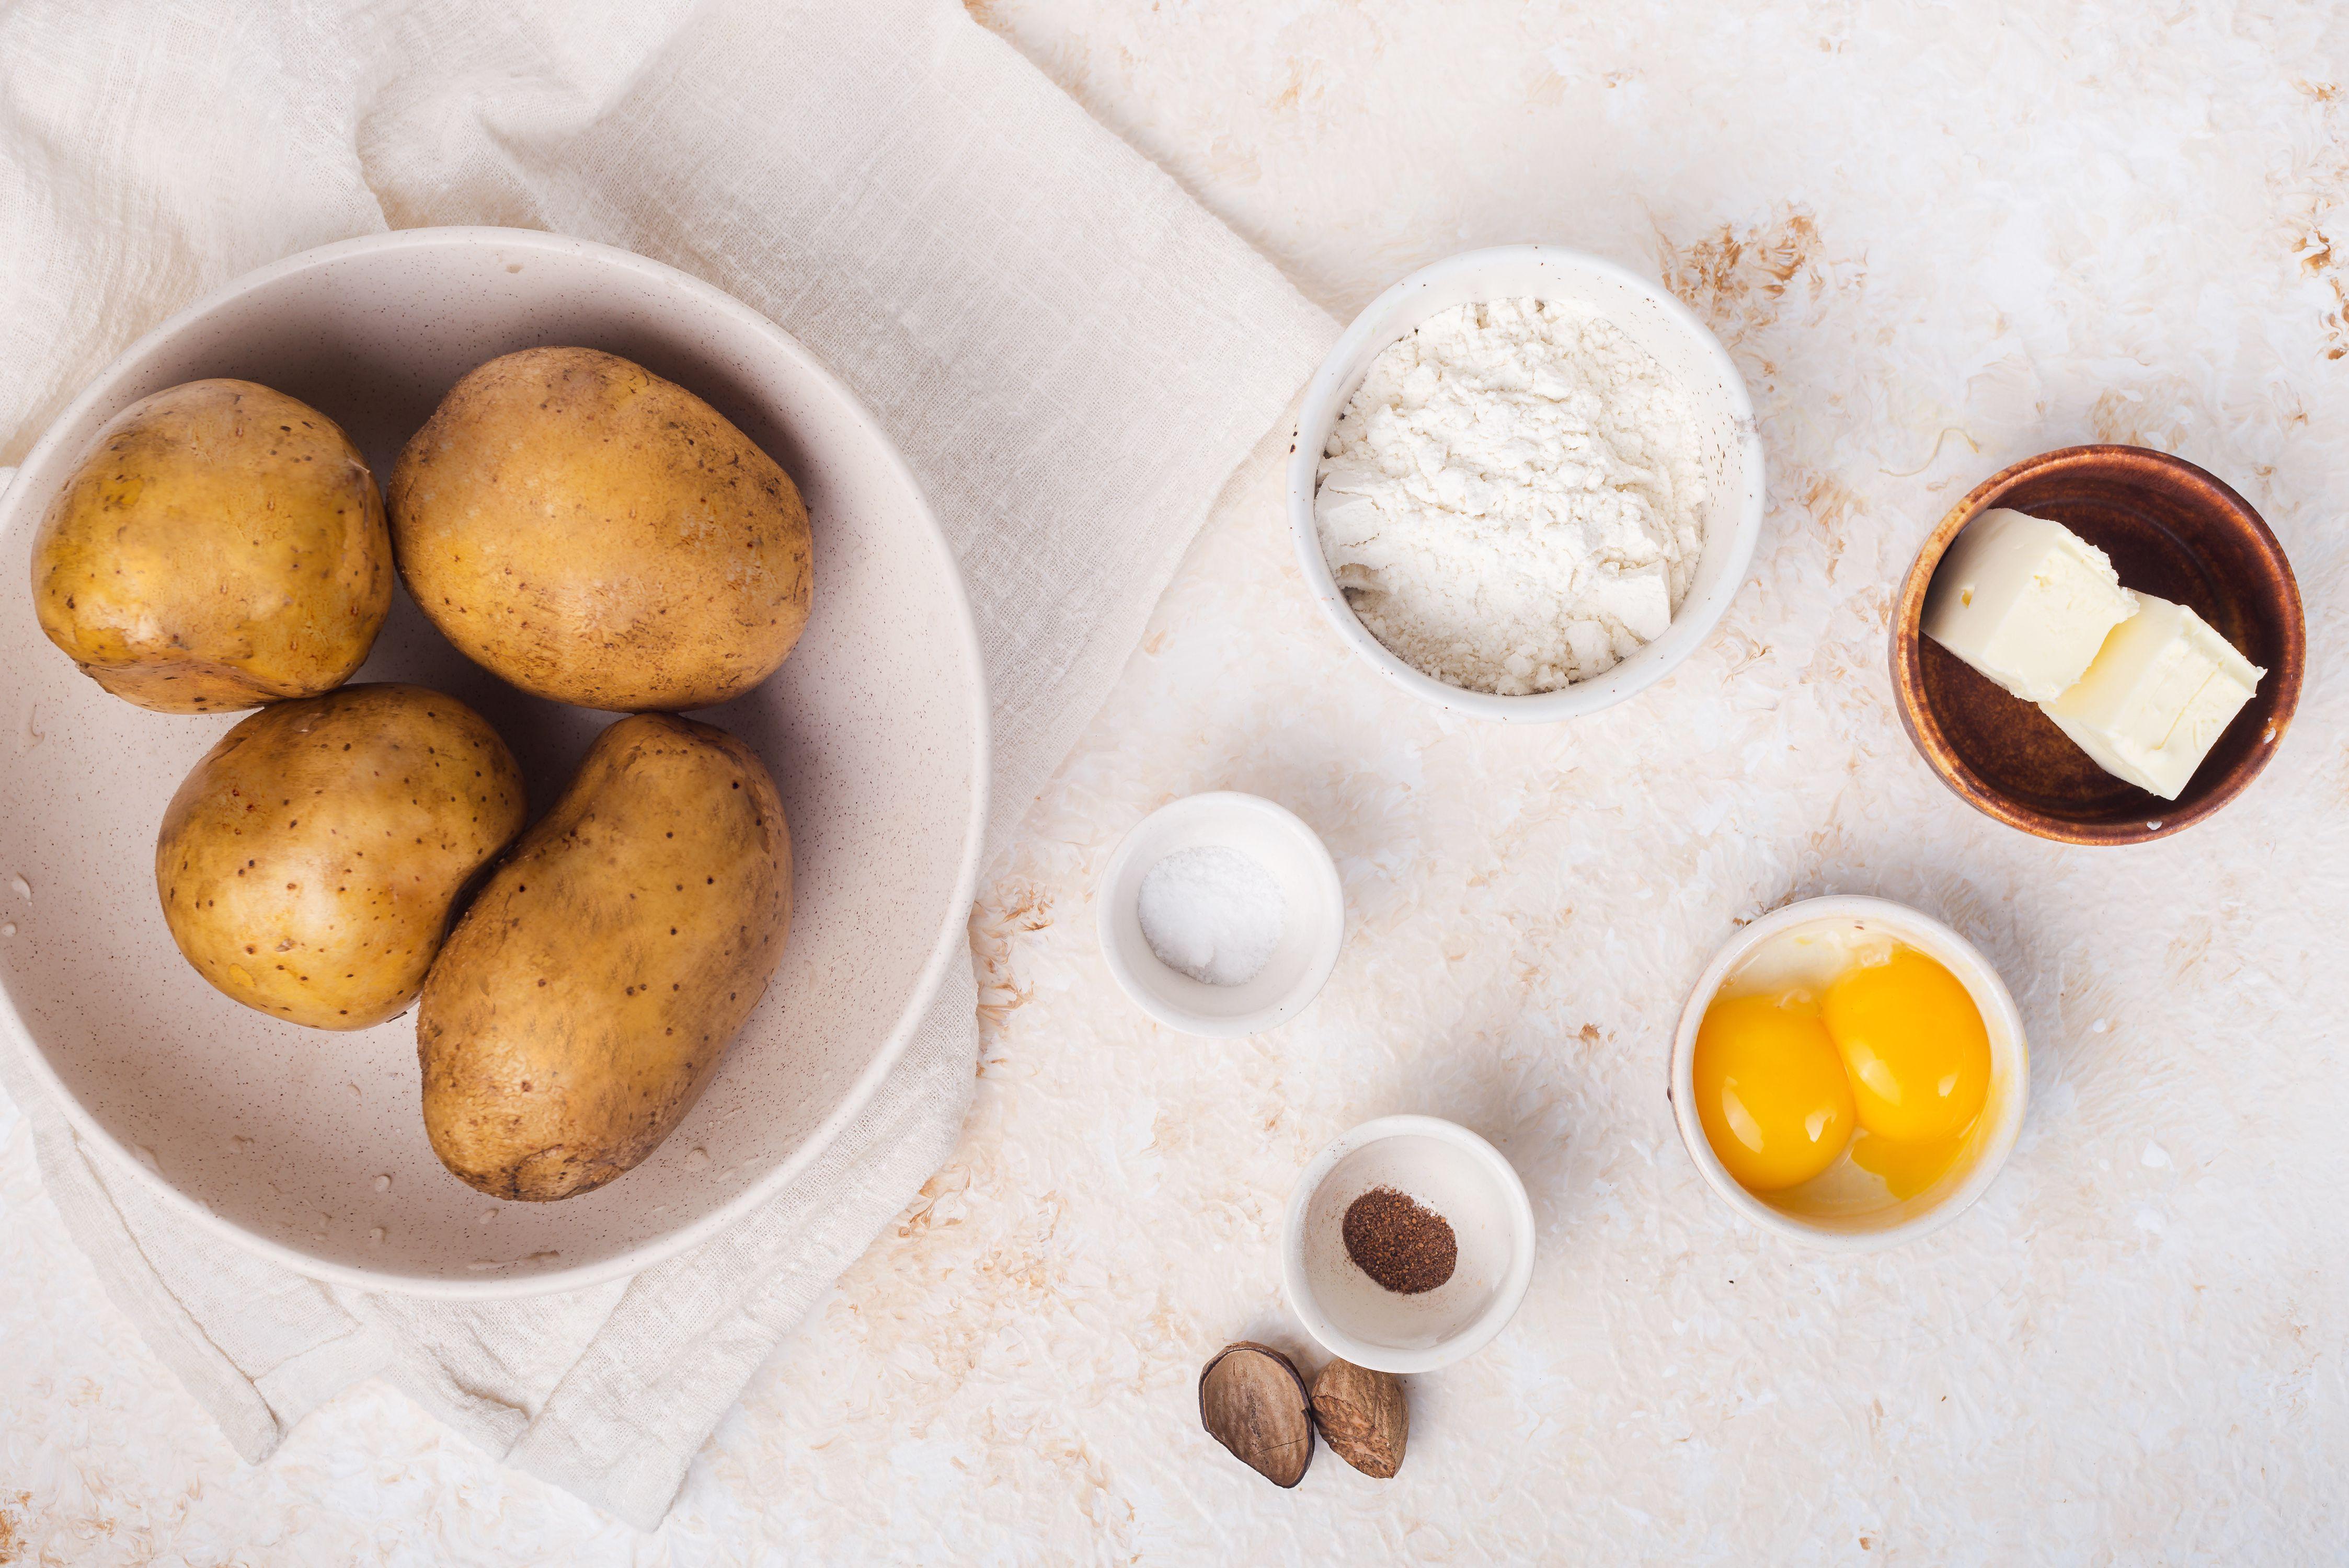 Potato noodle ingredients